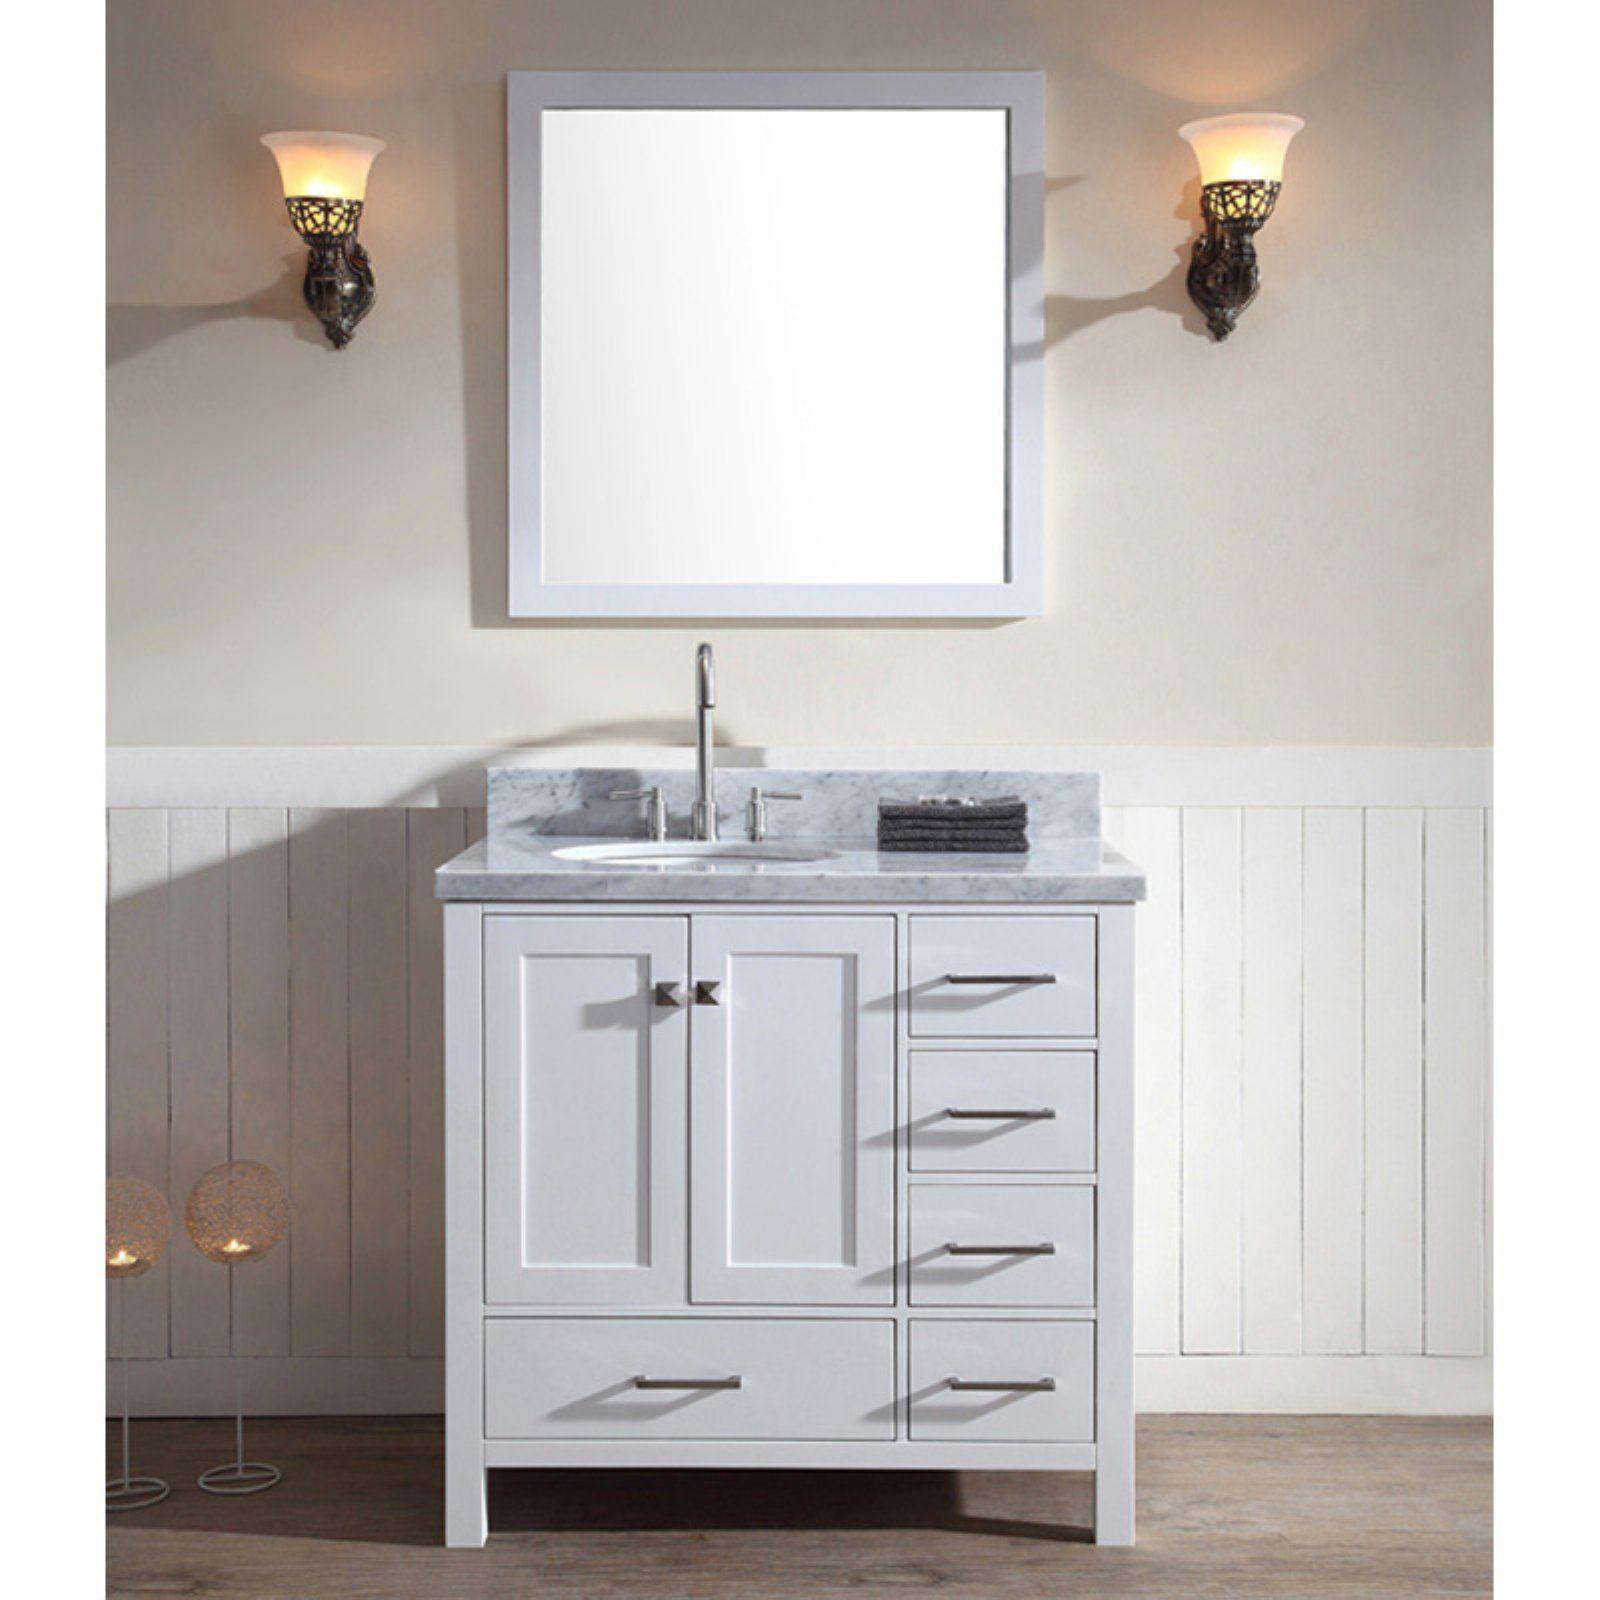 Ariel A037s L Cambridge 37 In Single Bathroom Vanity Set With Left Offset Sink Single Bathroom Vanity Single Sink Vanity Vanity Sink